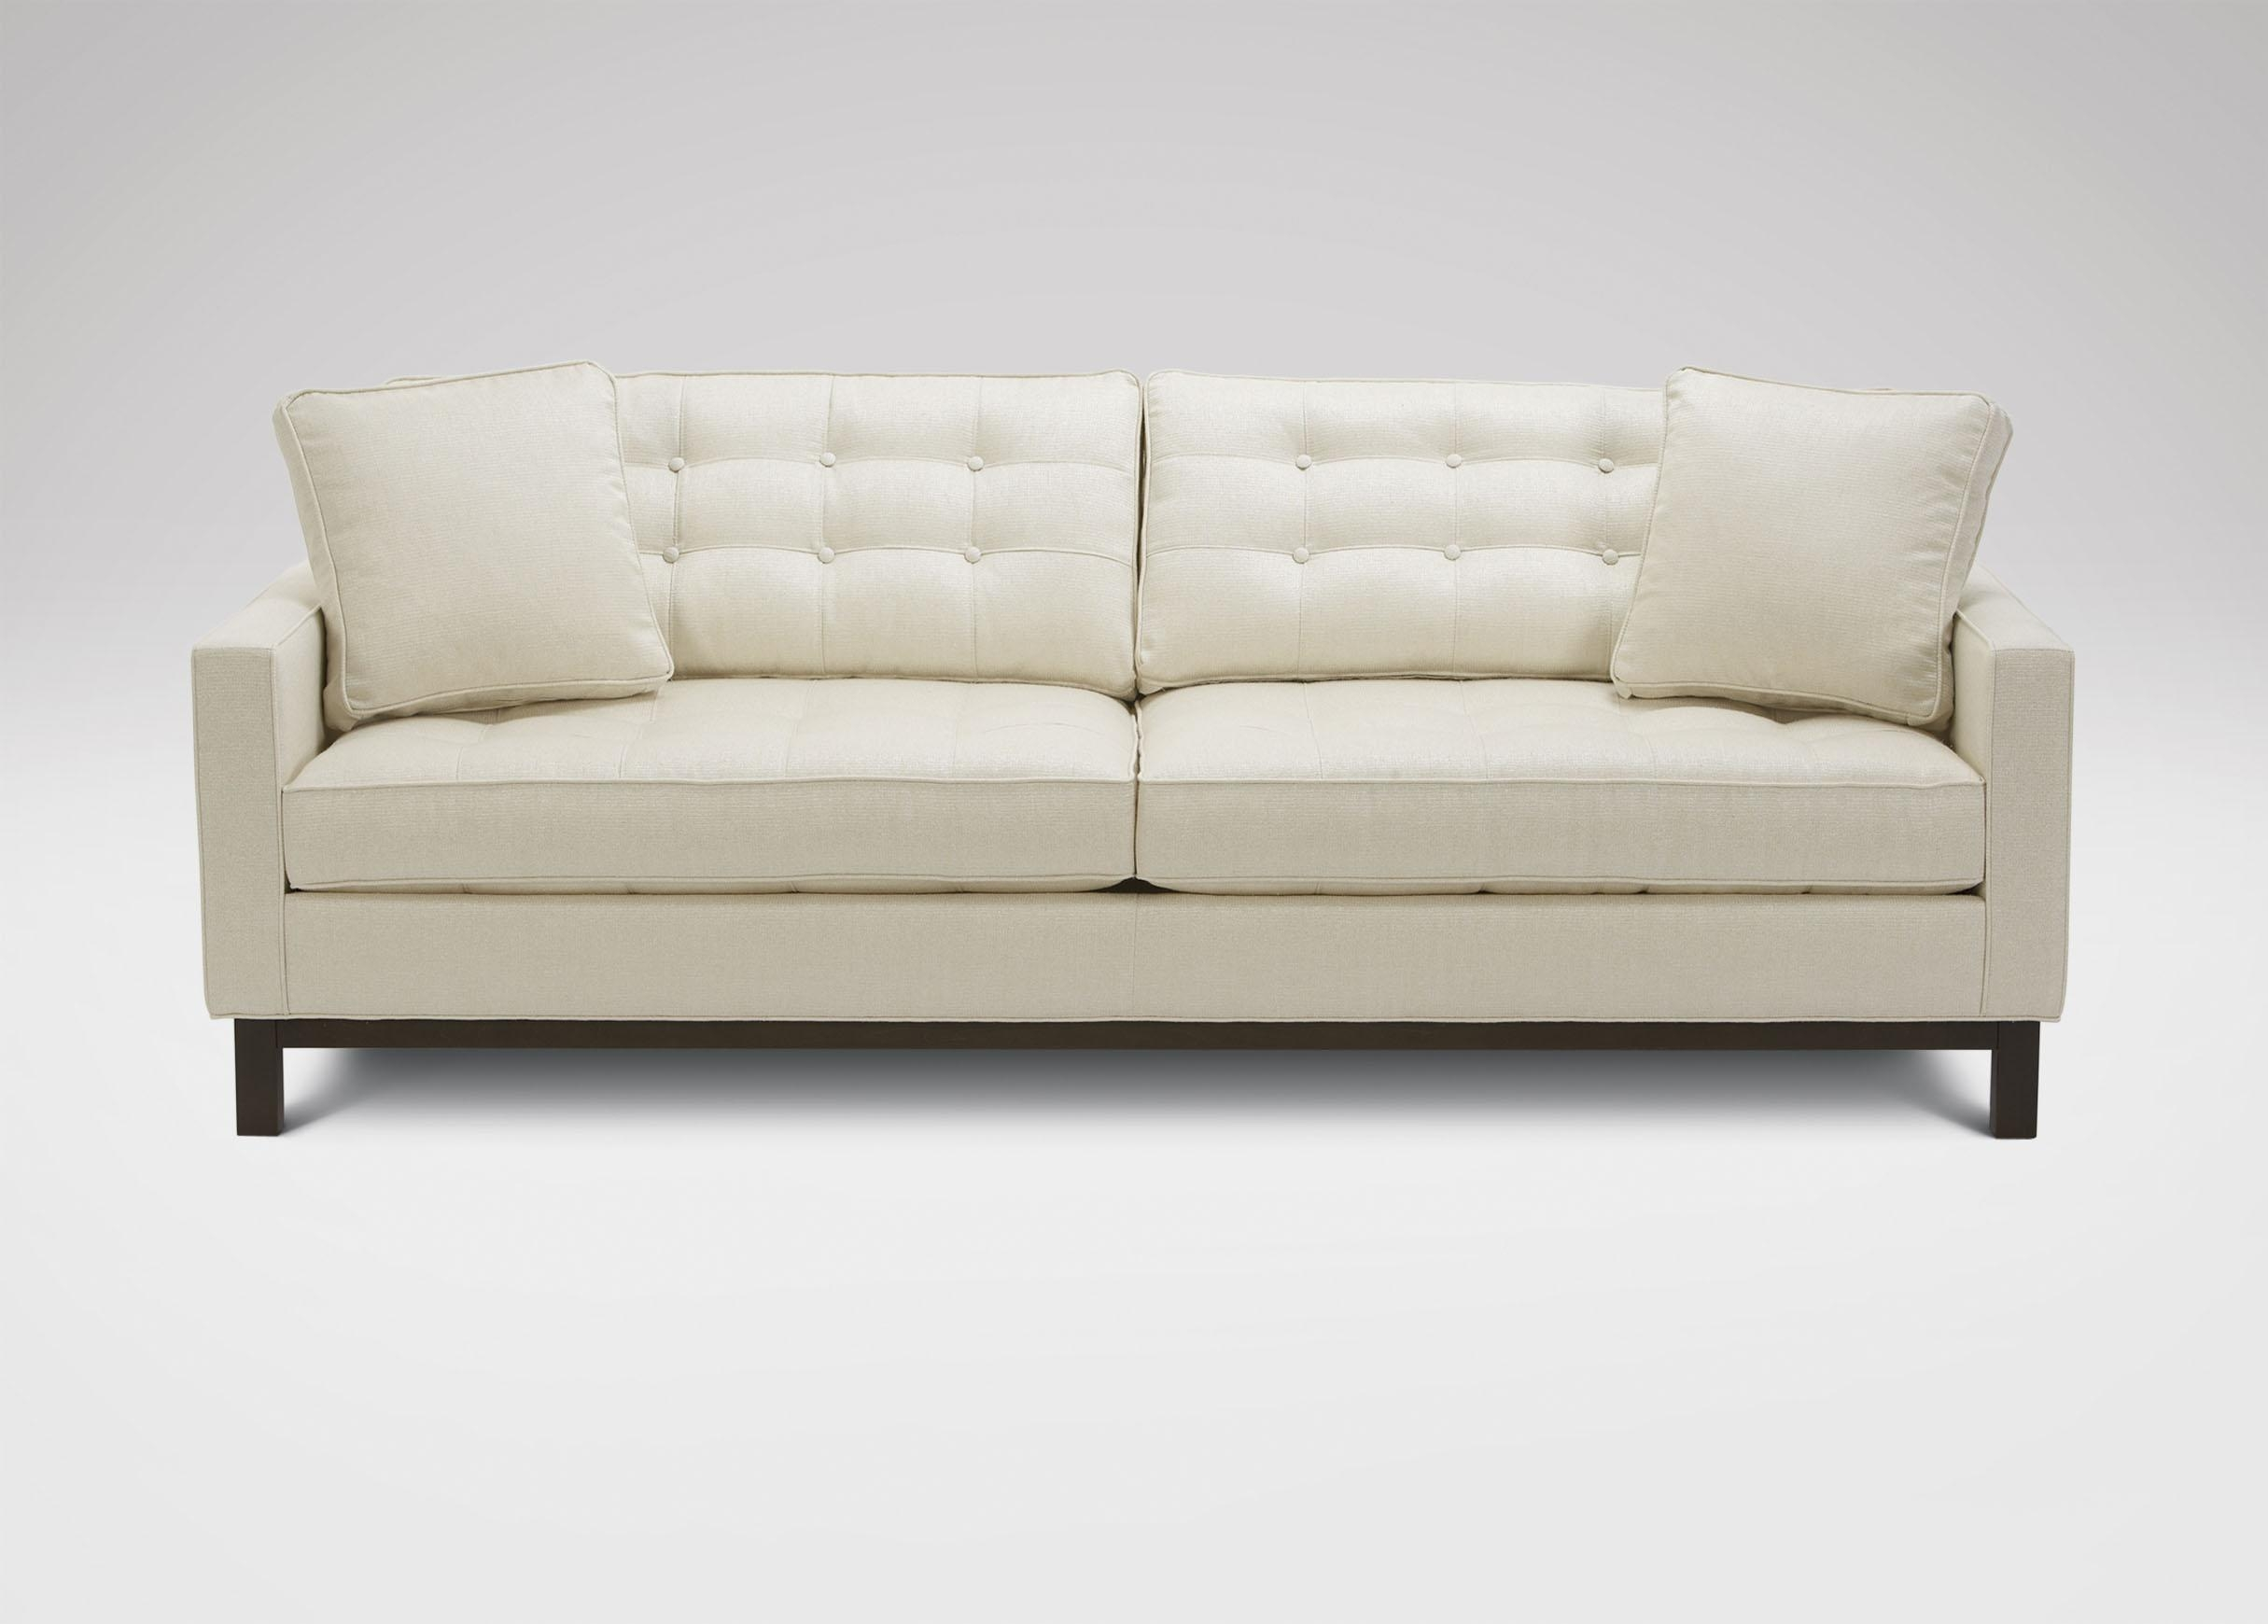 chadwick sofa cleaning london ontario 20 top sofas ideas